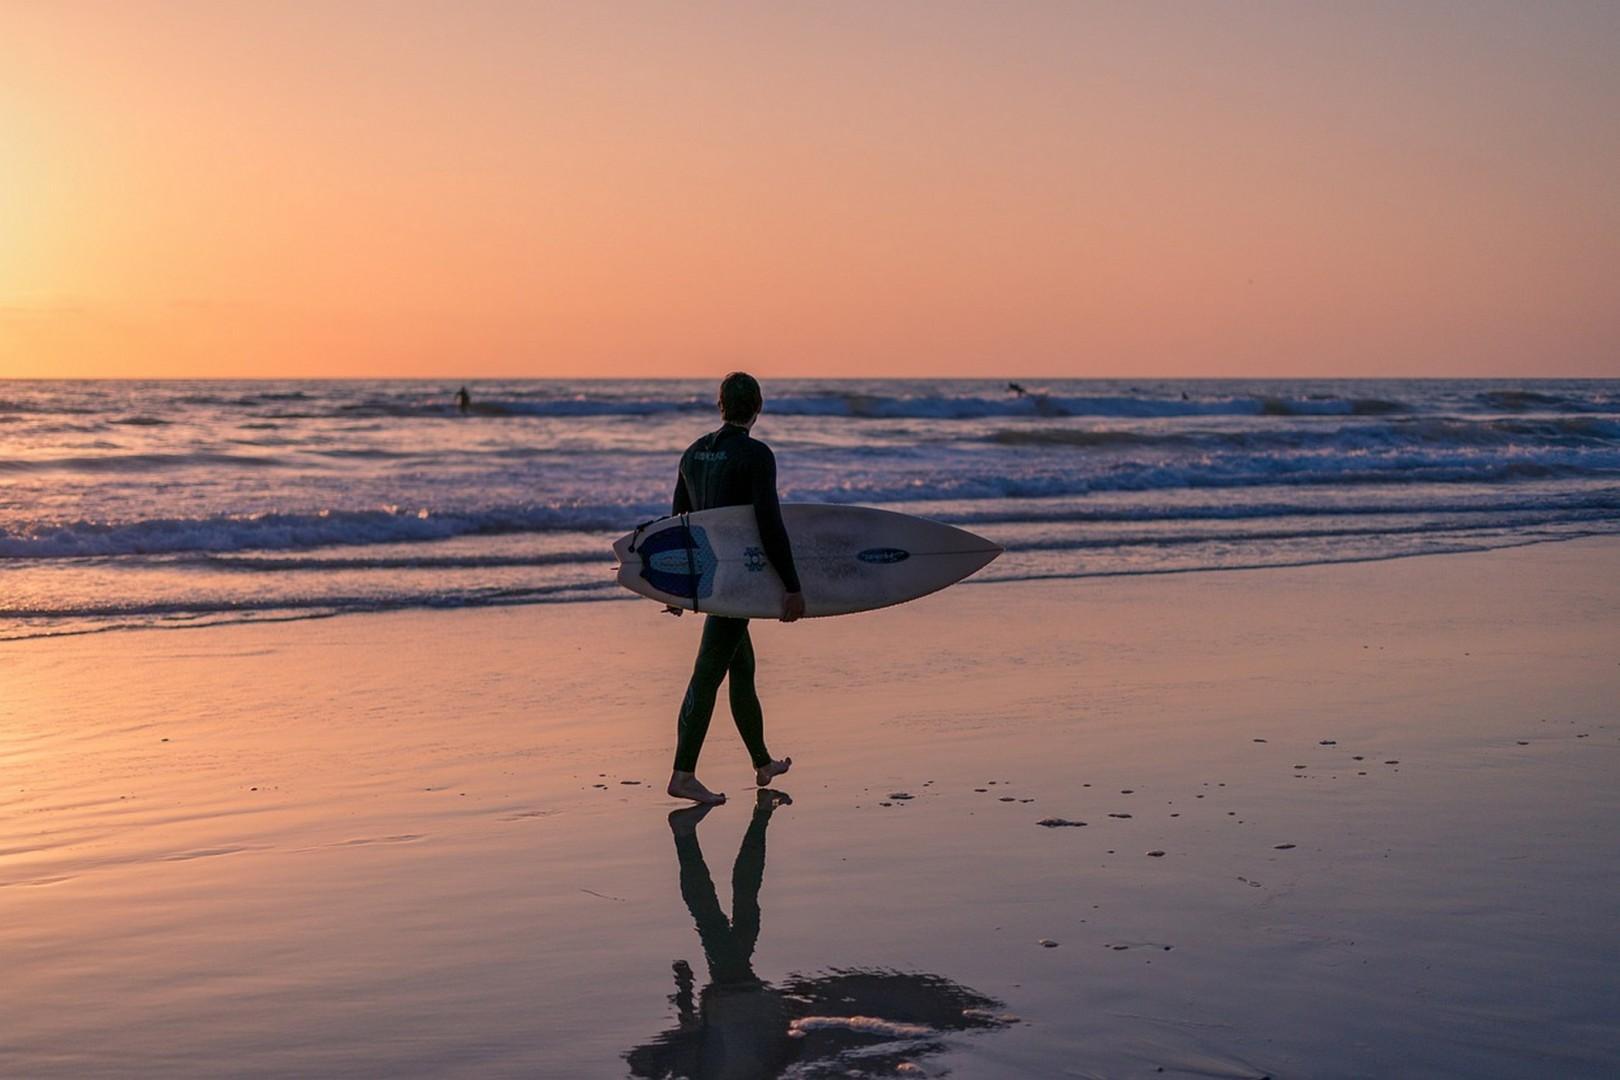 sunset-Mission-beach-san-diego (2)